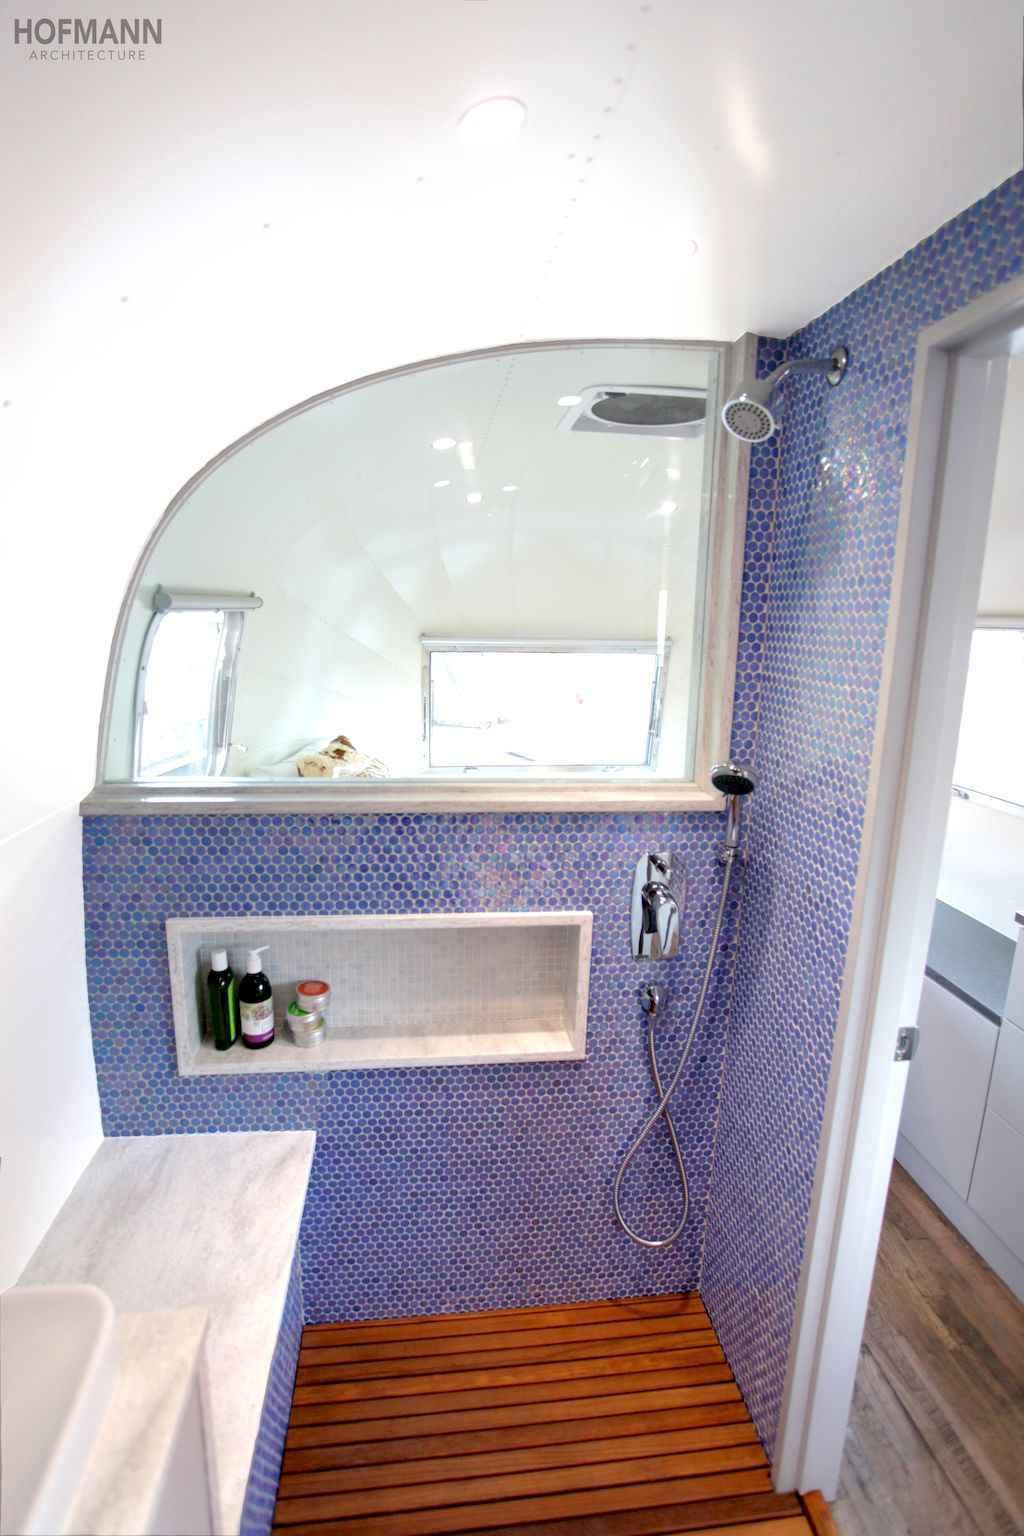 30 Simple Diy Rv Shower Remodel Ideas For Amazing Camper